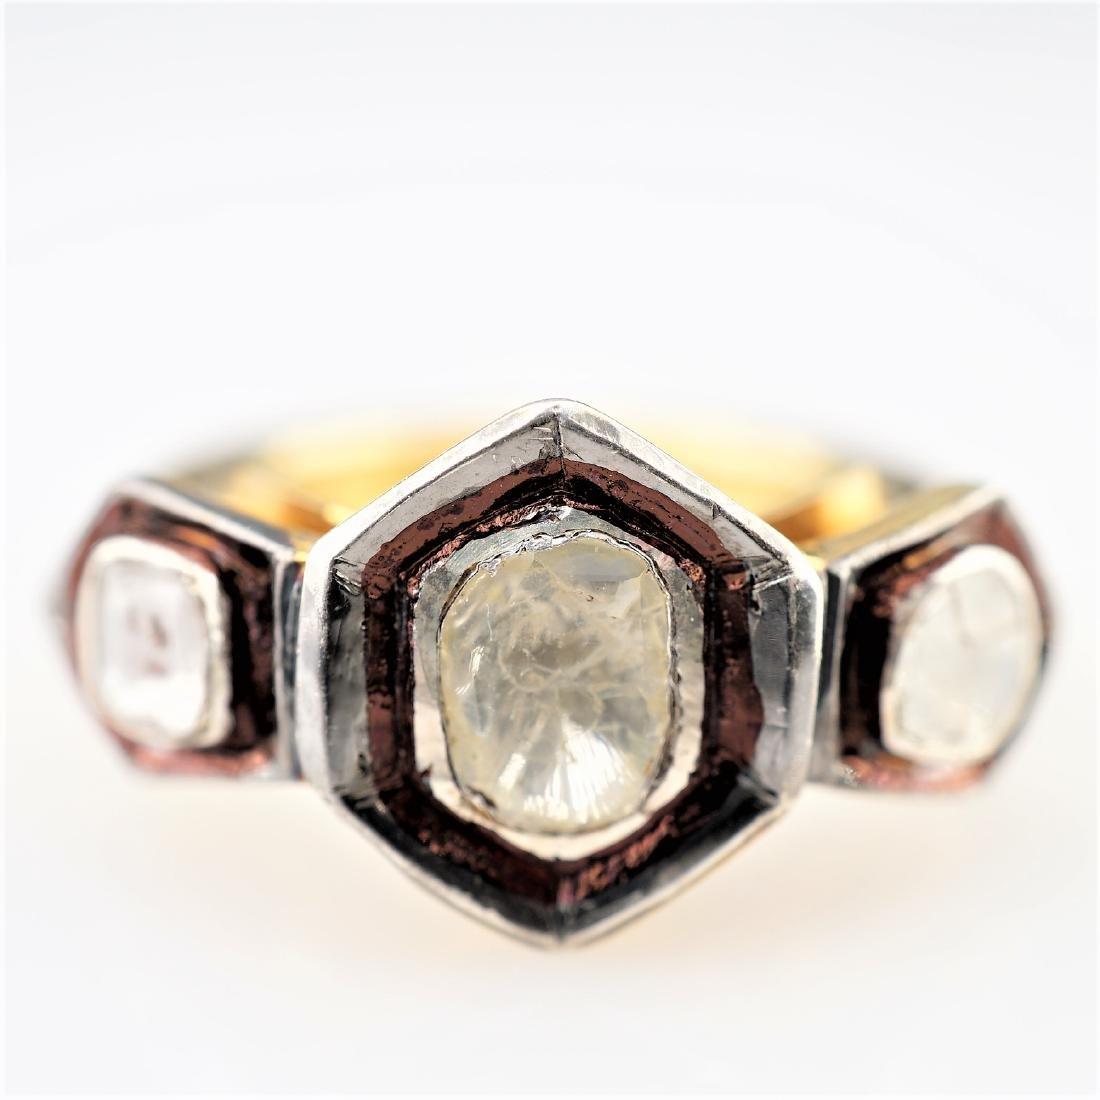 2.10 CTTW Rose Cut Diamond Ring in 925 sz 8